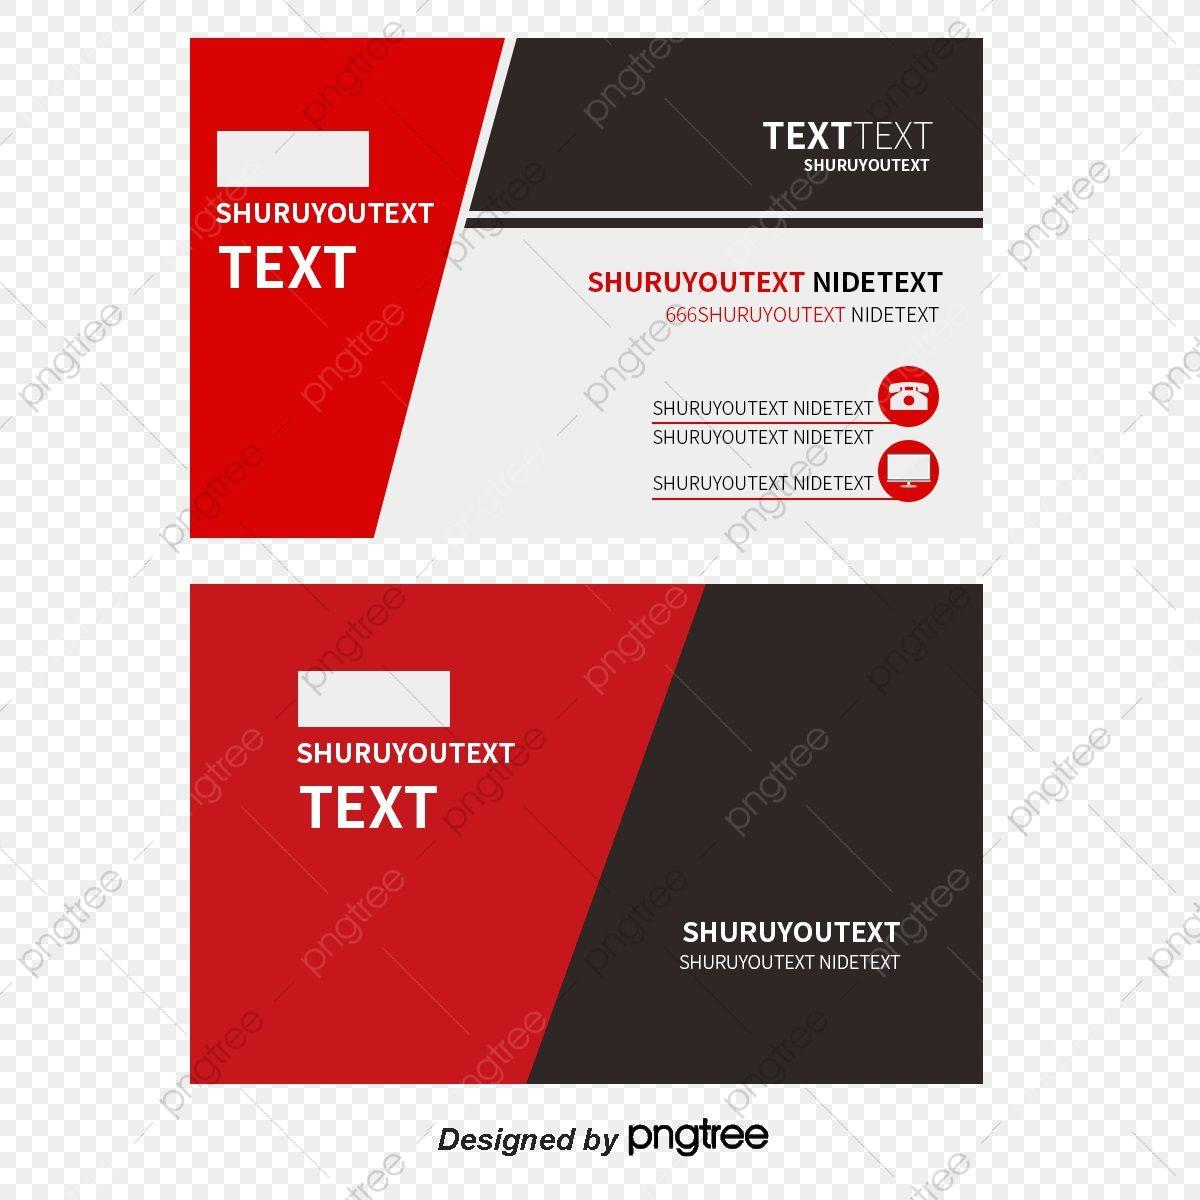 003 Stupendou Simple Visiting Card Design Psd Idea  Minimalist Busines Template Free File Download In PhotoshopFull